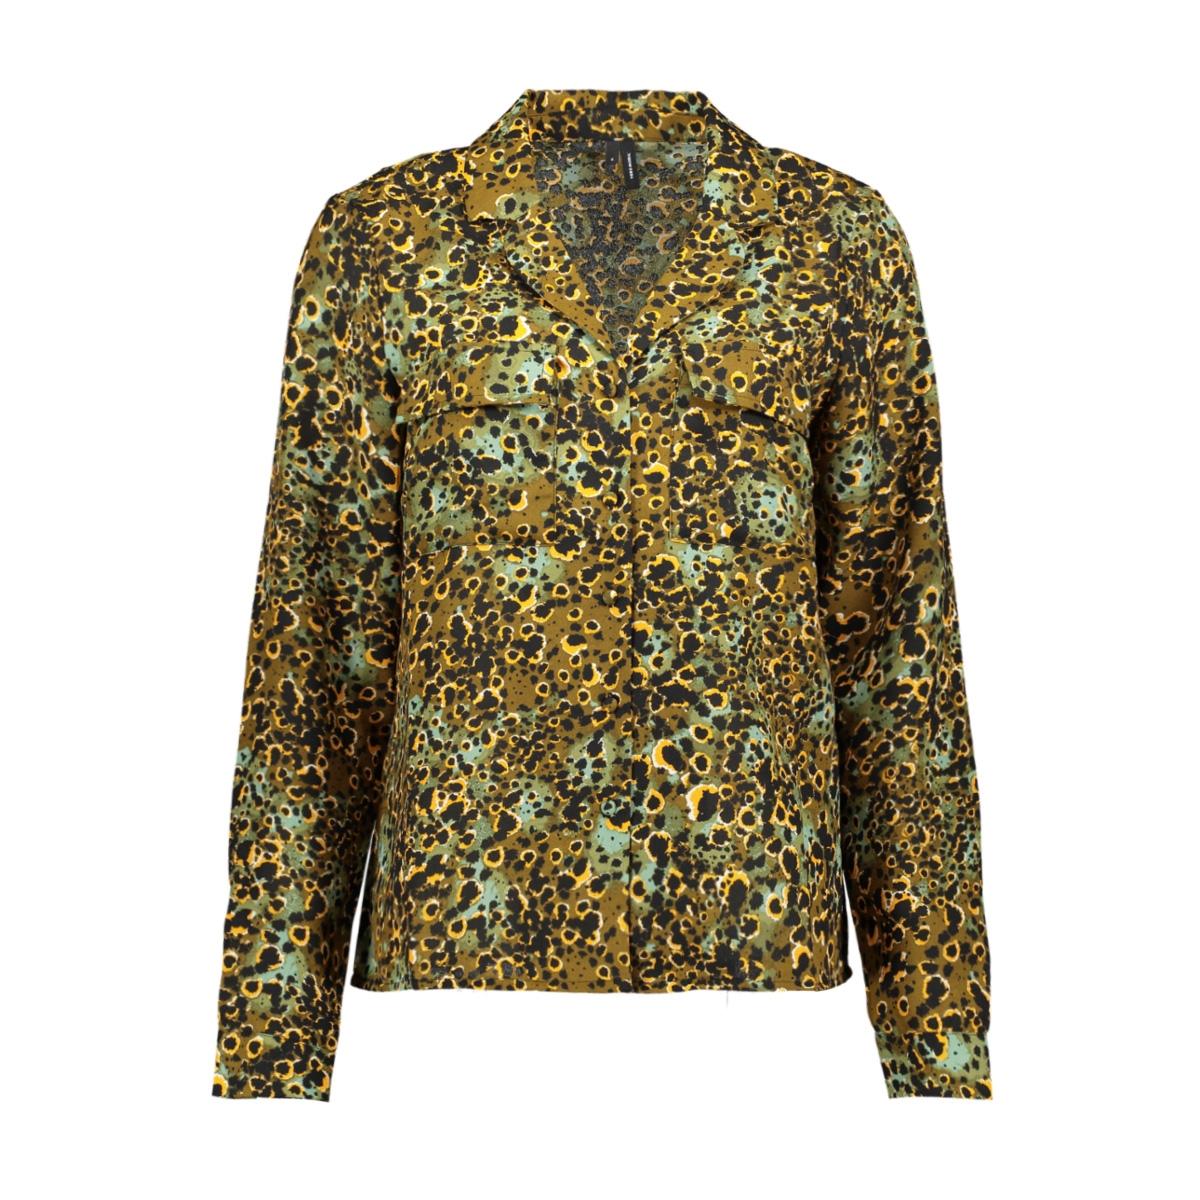 vmlaia l/s shirt sb2 10229661 vero moda blouse millitary olive/laila